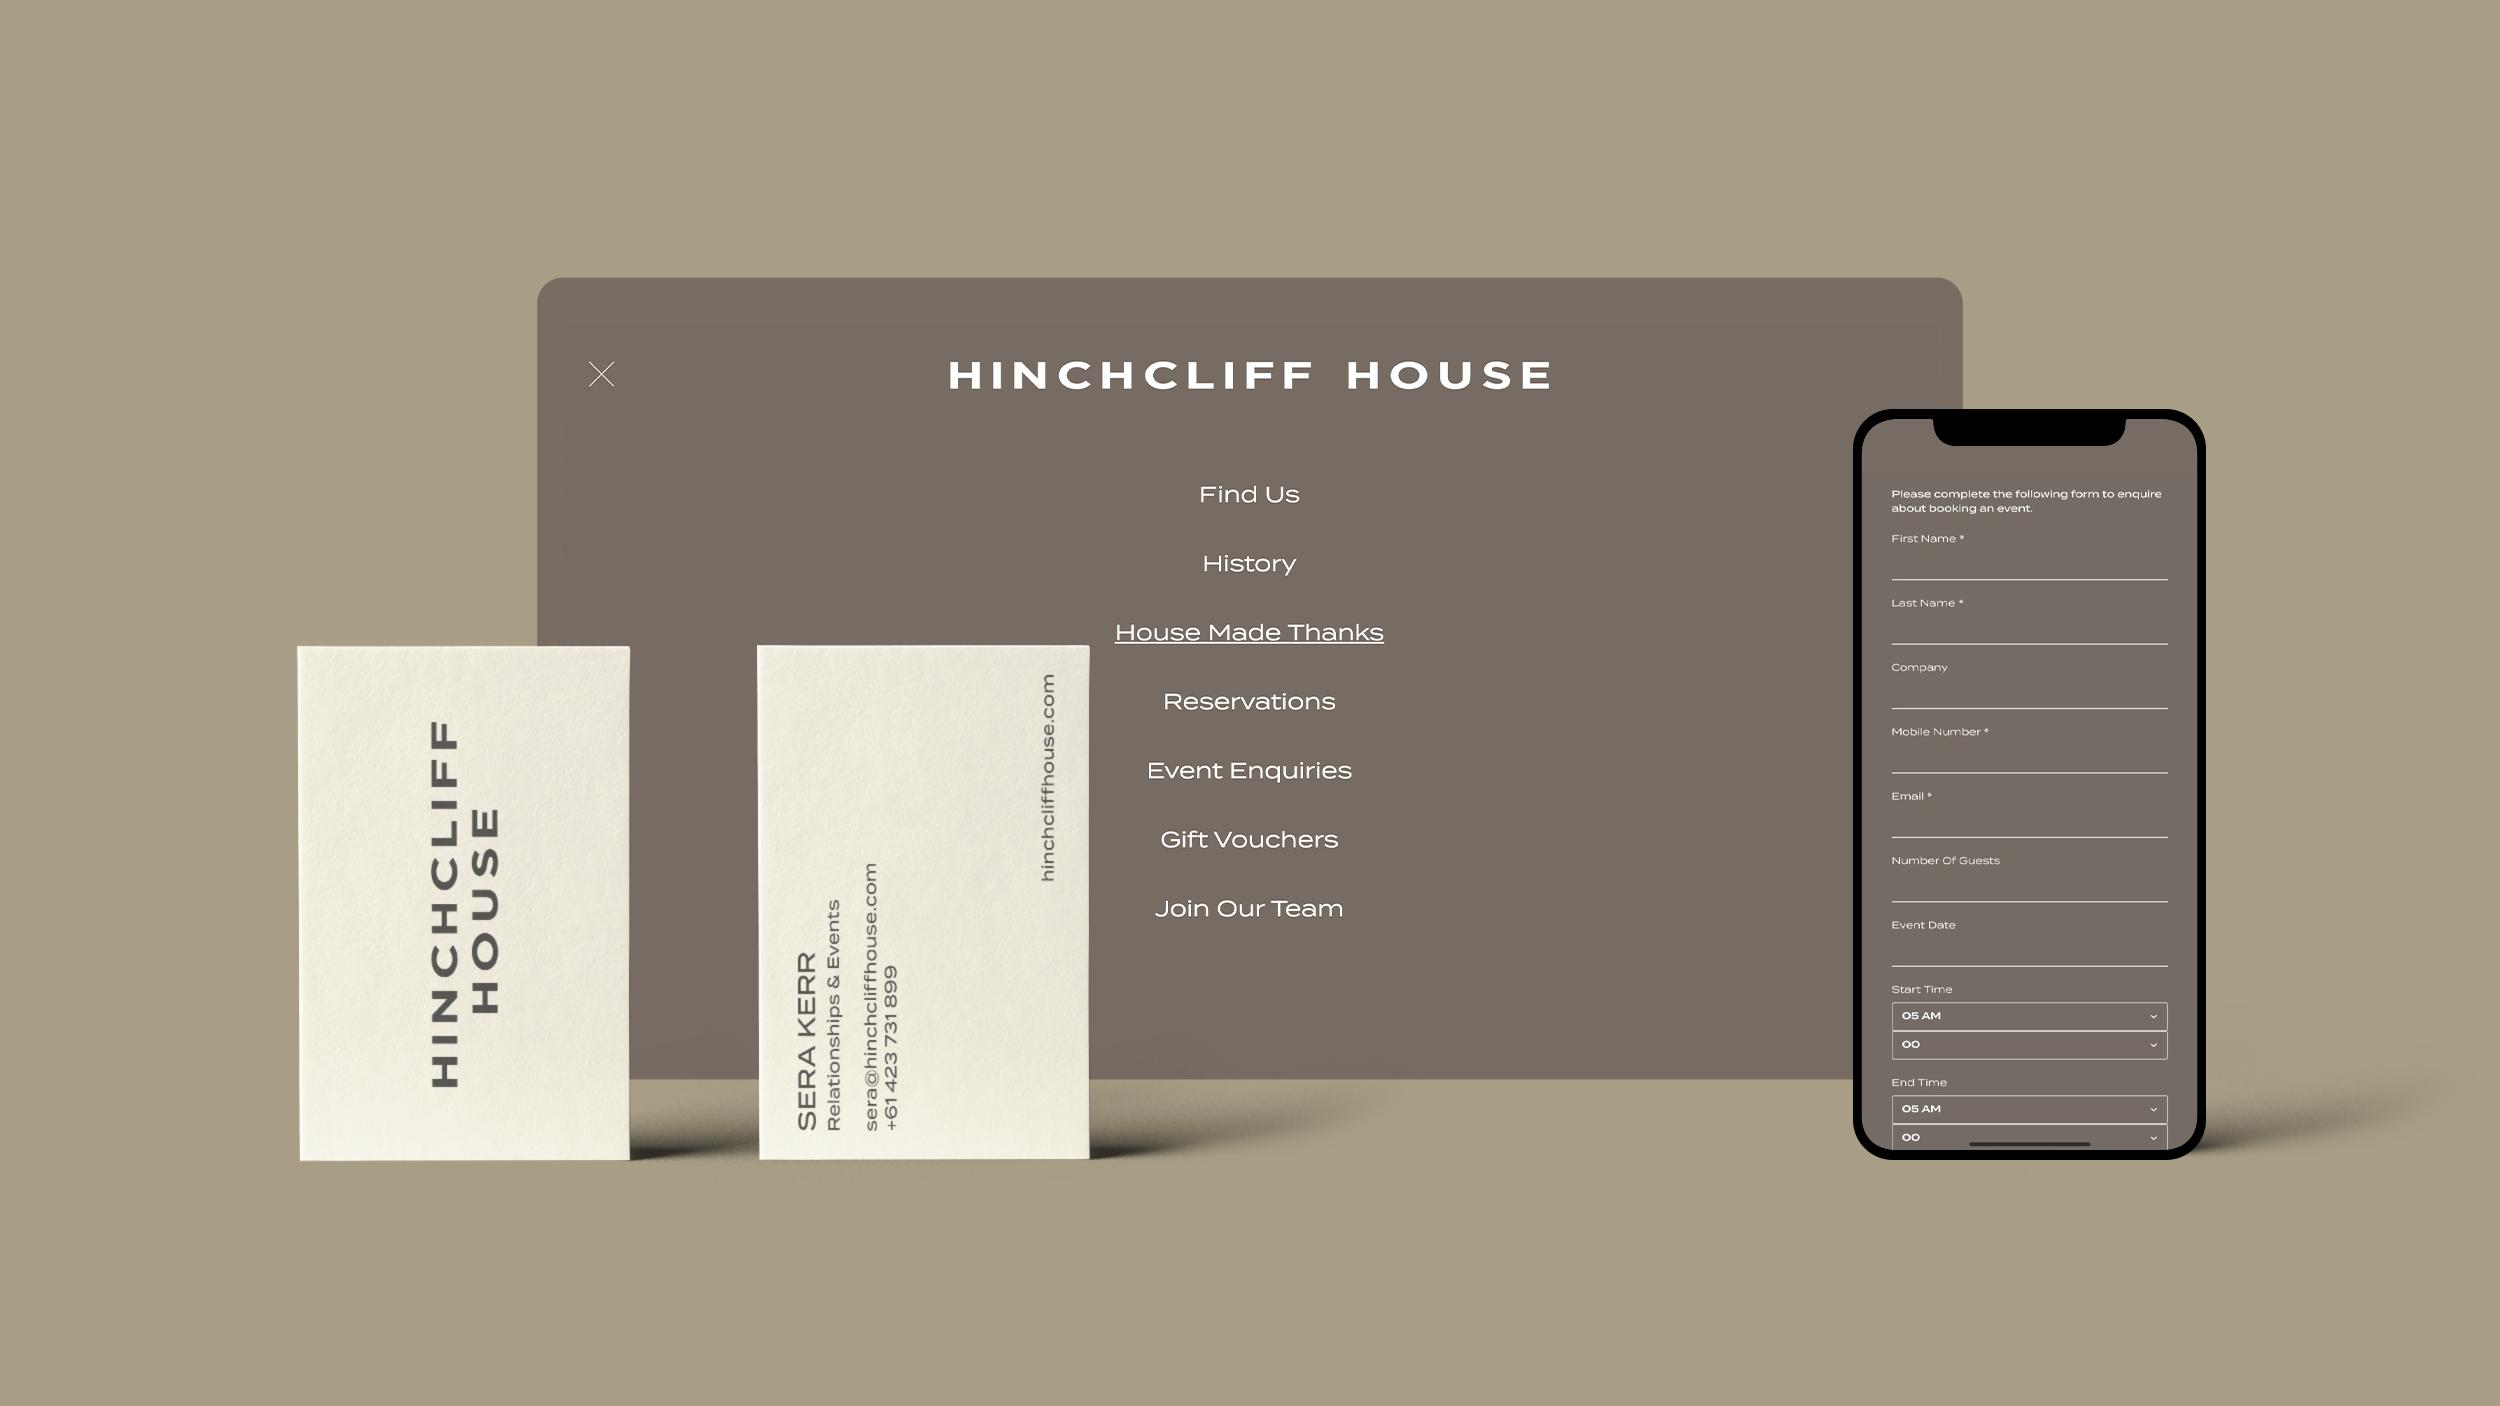 Distil_Hinchcliff_House_Mockup-1